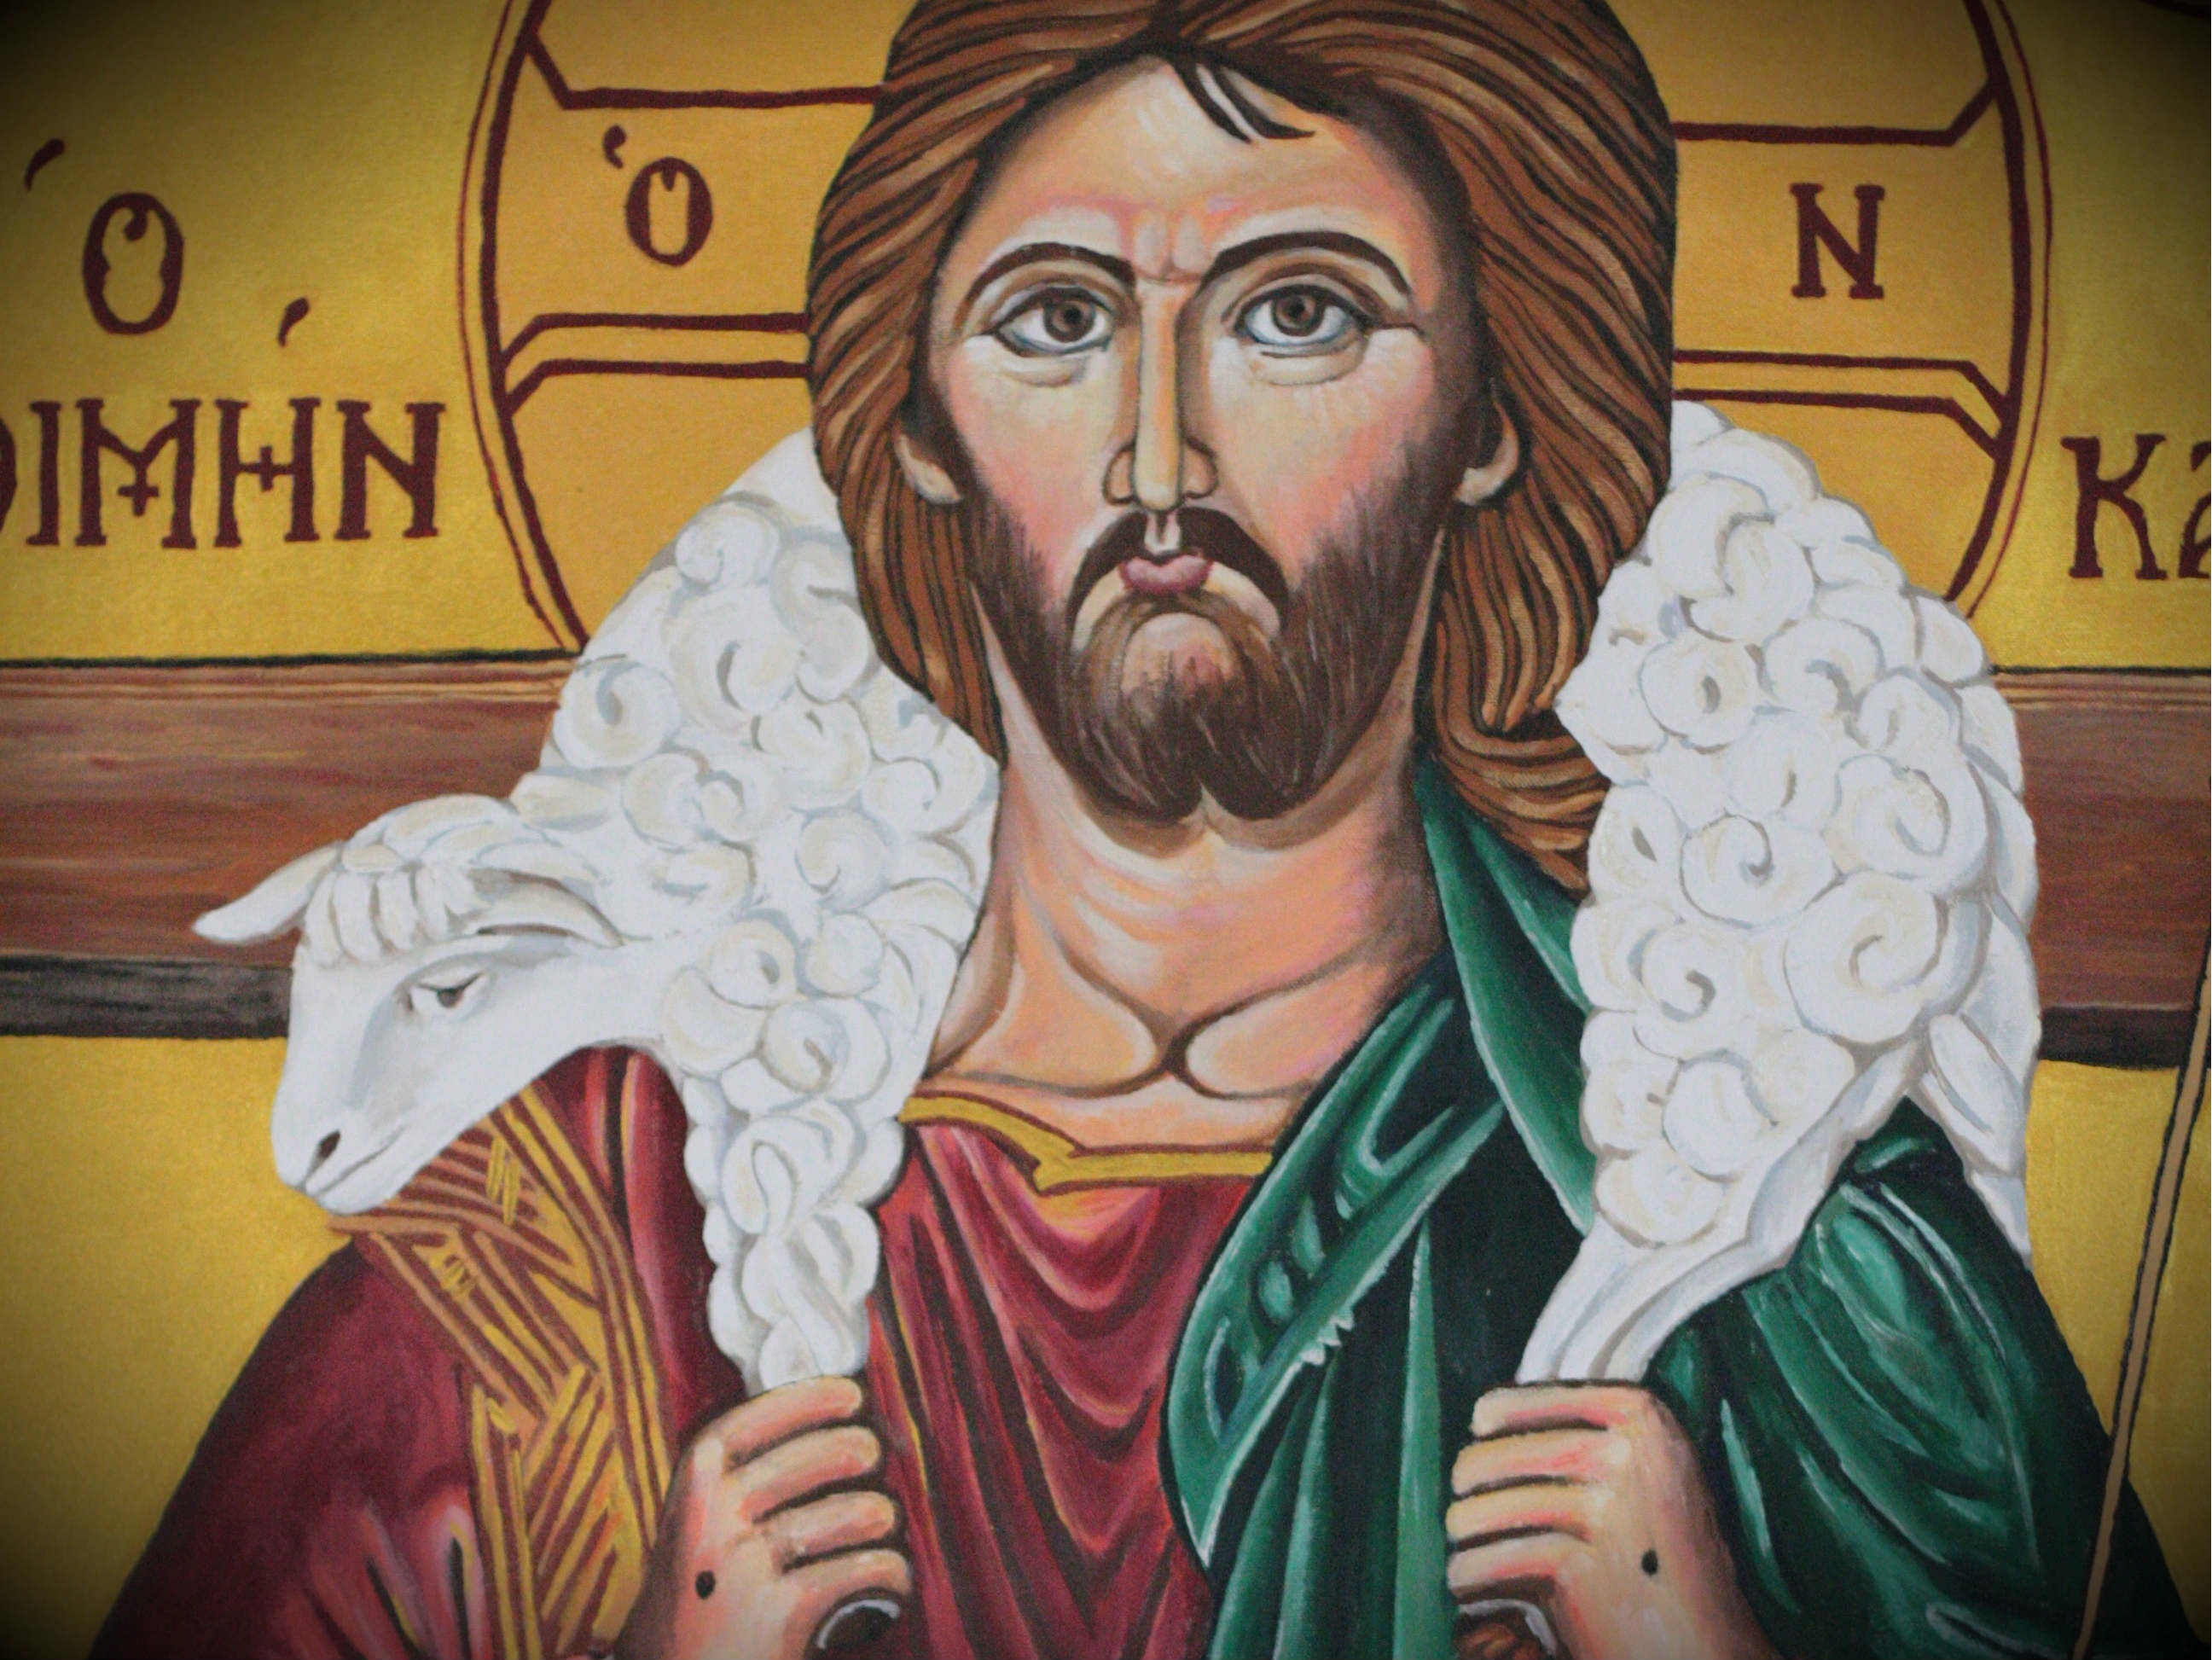 Thomas Aquinas Jesus Christ as the Good shepherd lays down his life for the sheep John